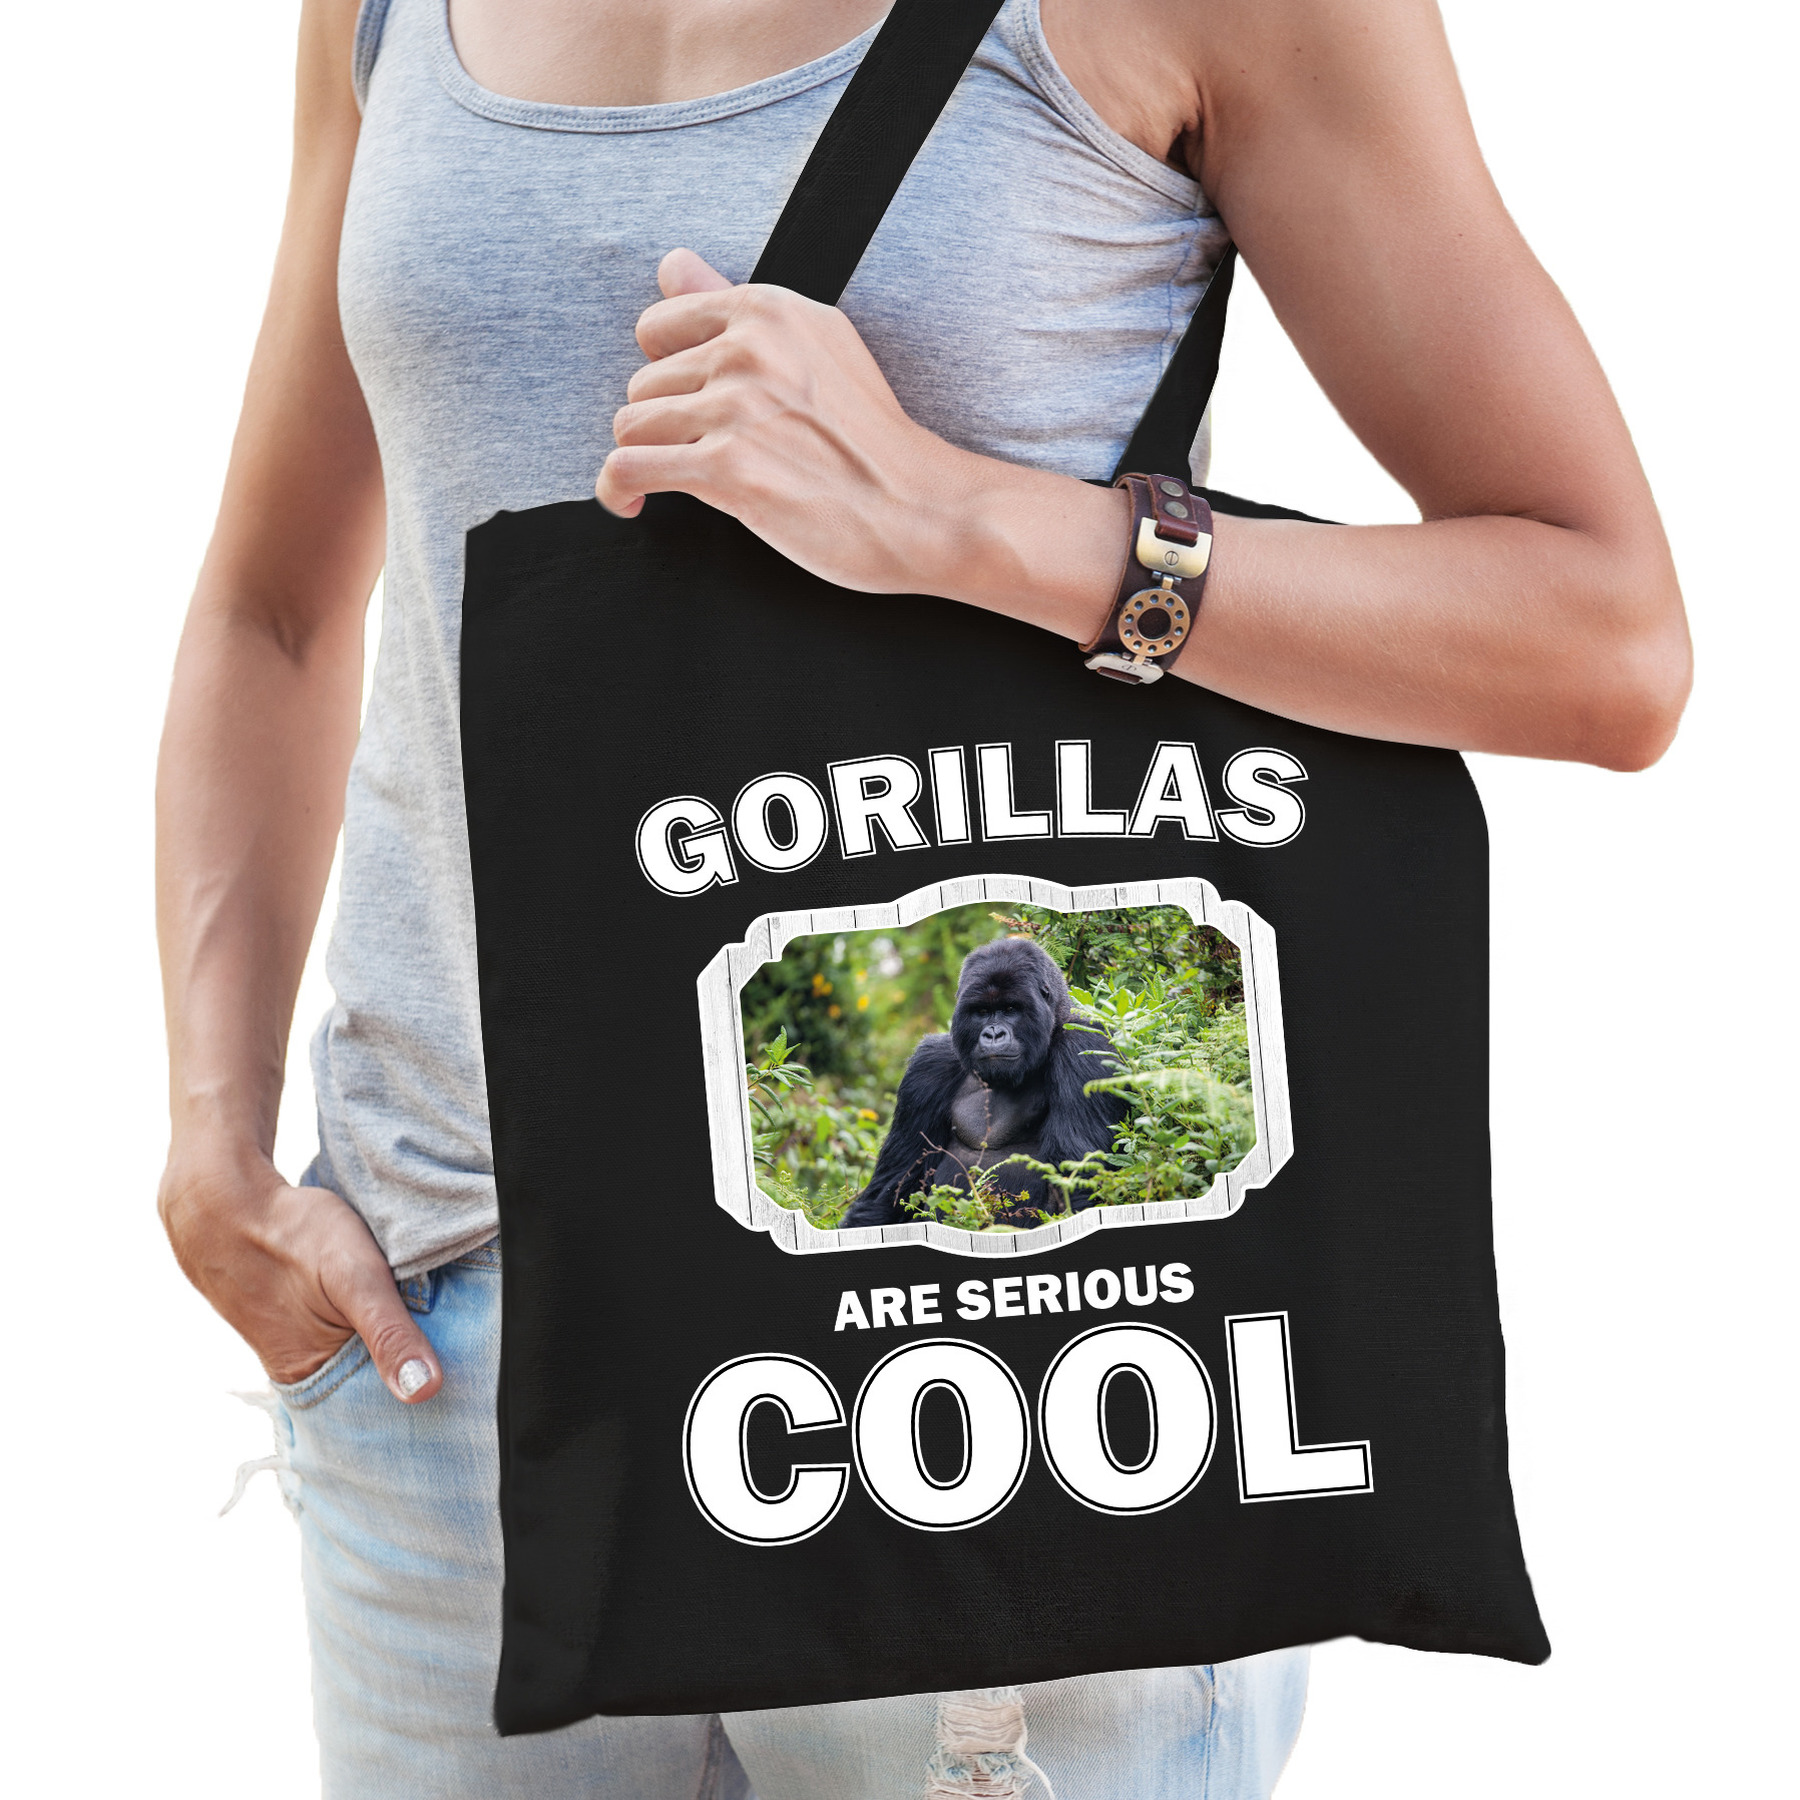 Katoenen tasje gorillas are serious cool zwart - gorilla apen/ gorilla cadeau tas